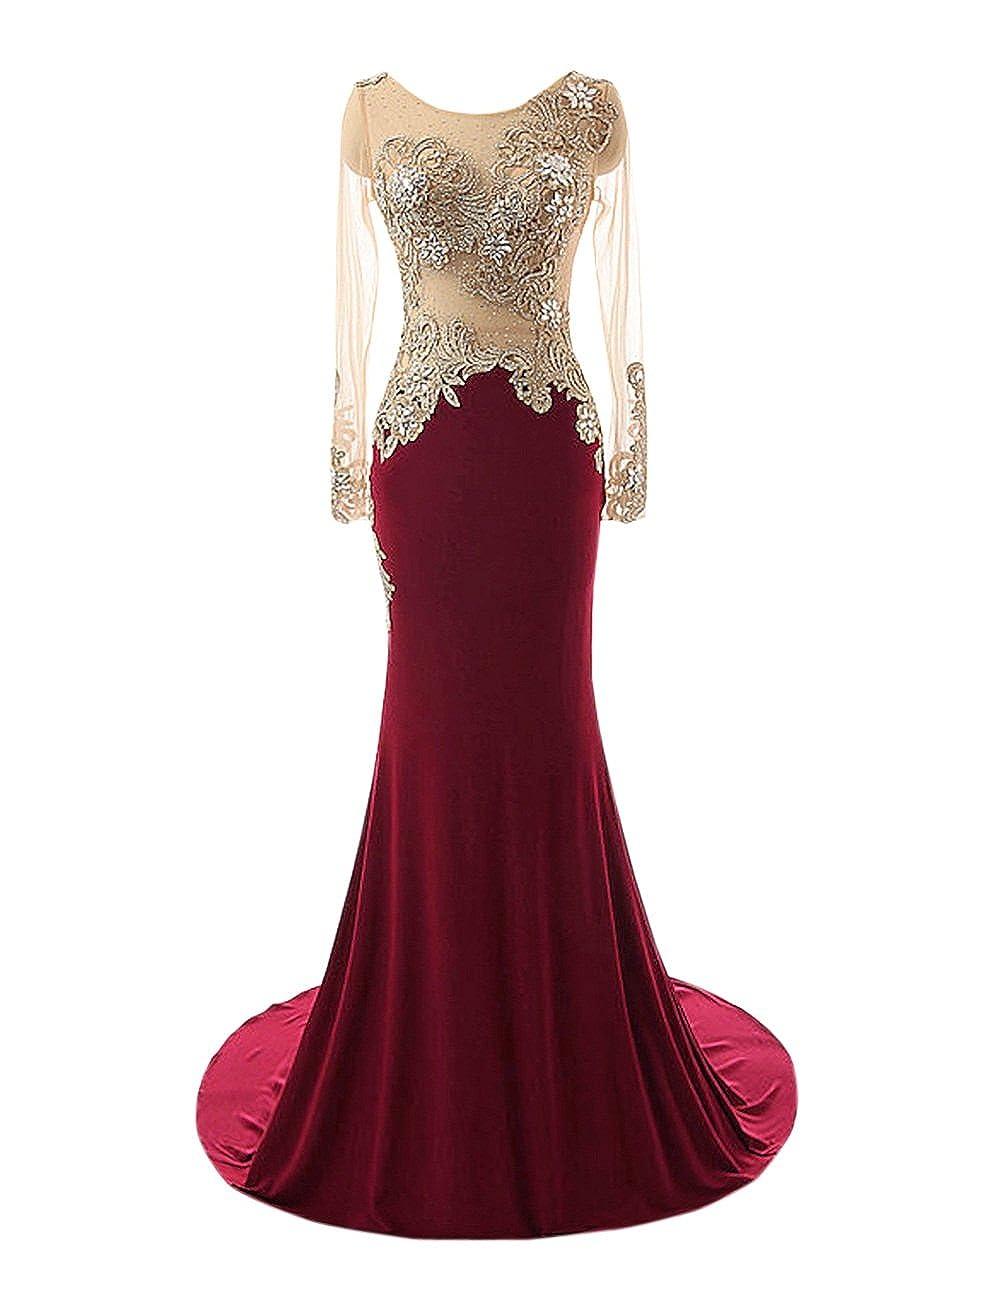 Burgundy Bess Bridal Women's Mermaid Beaded Sheer Long Sleeves Prom Evening Dresses